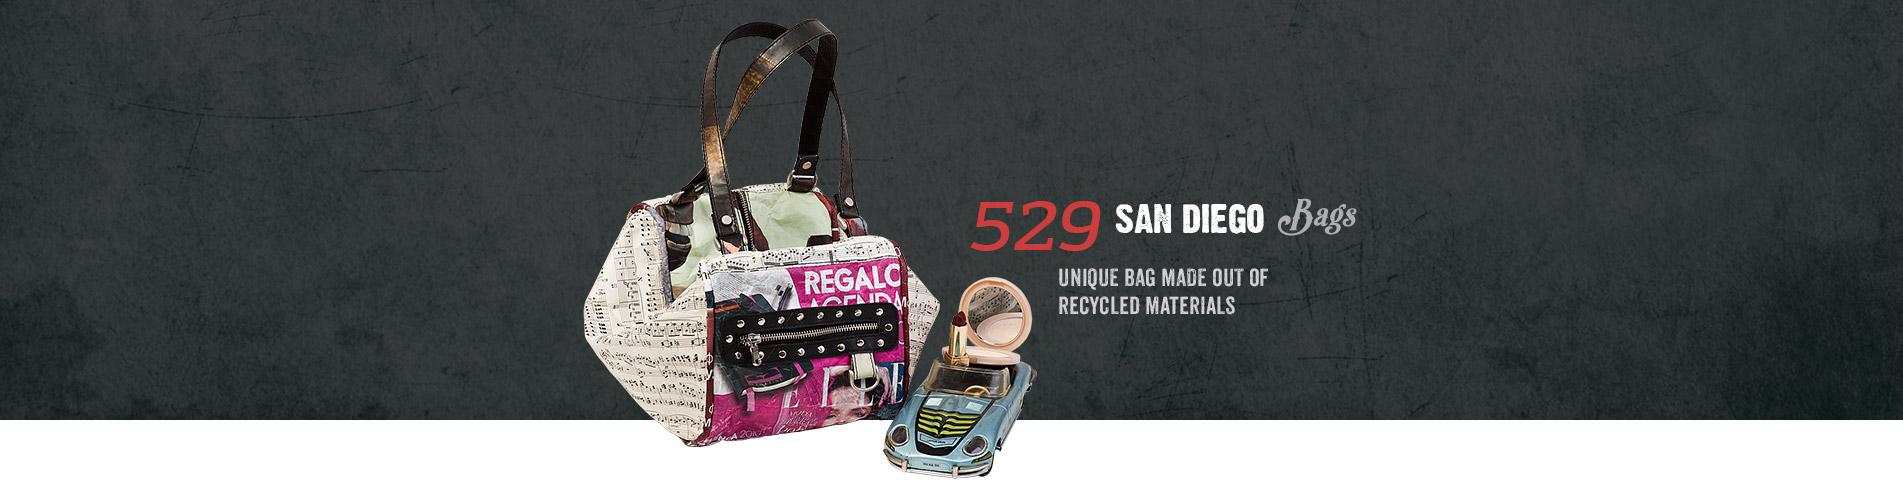 529 San Diego Bags